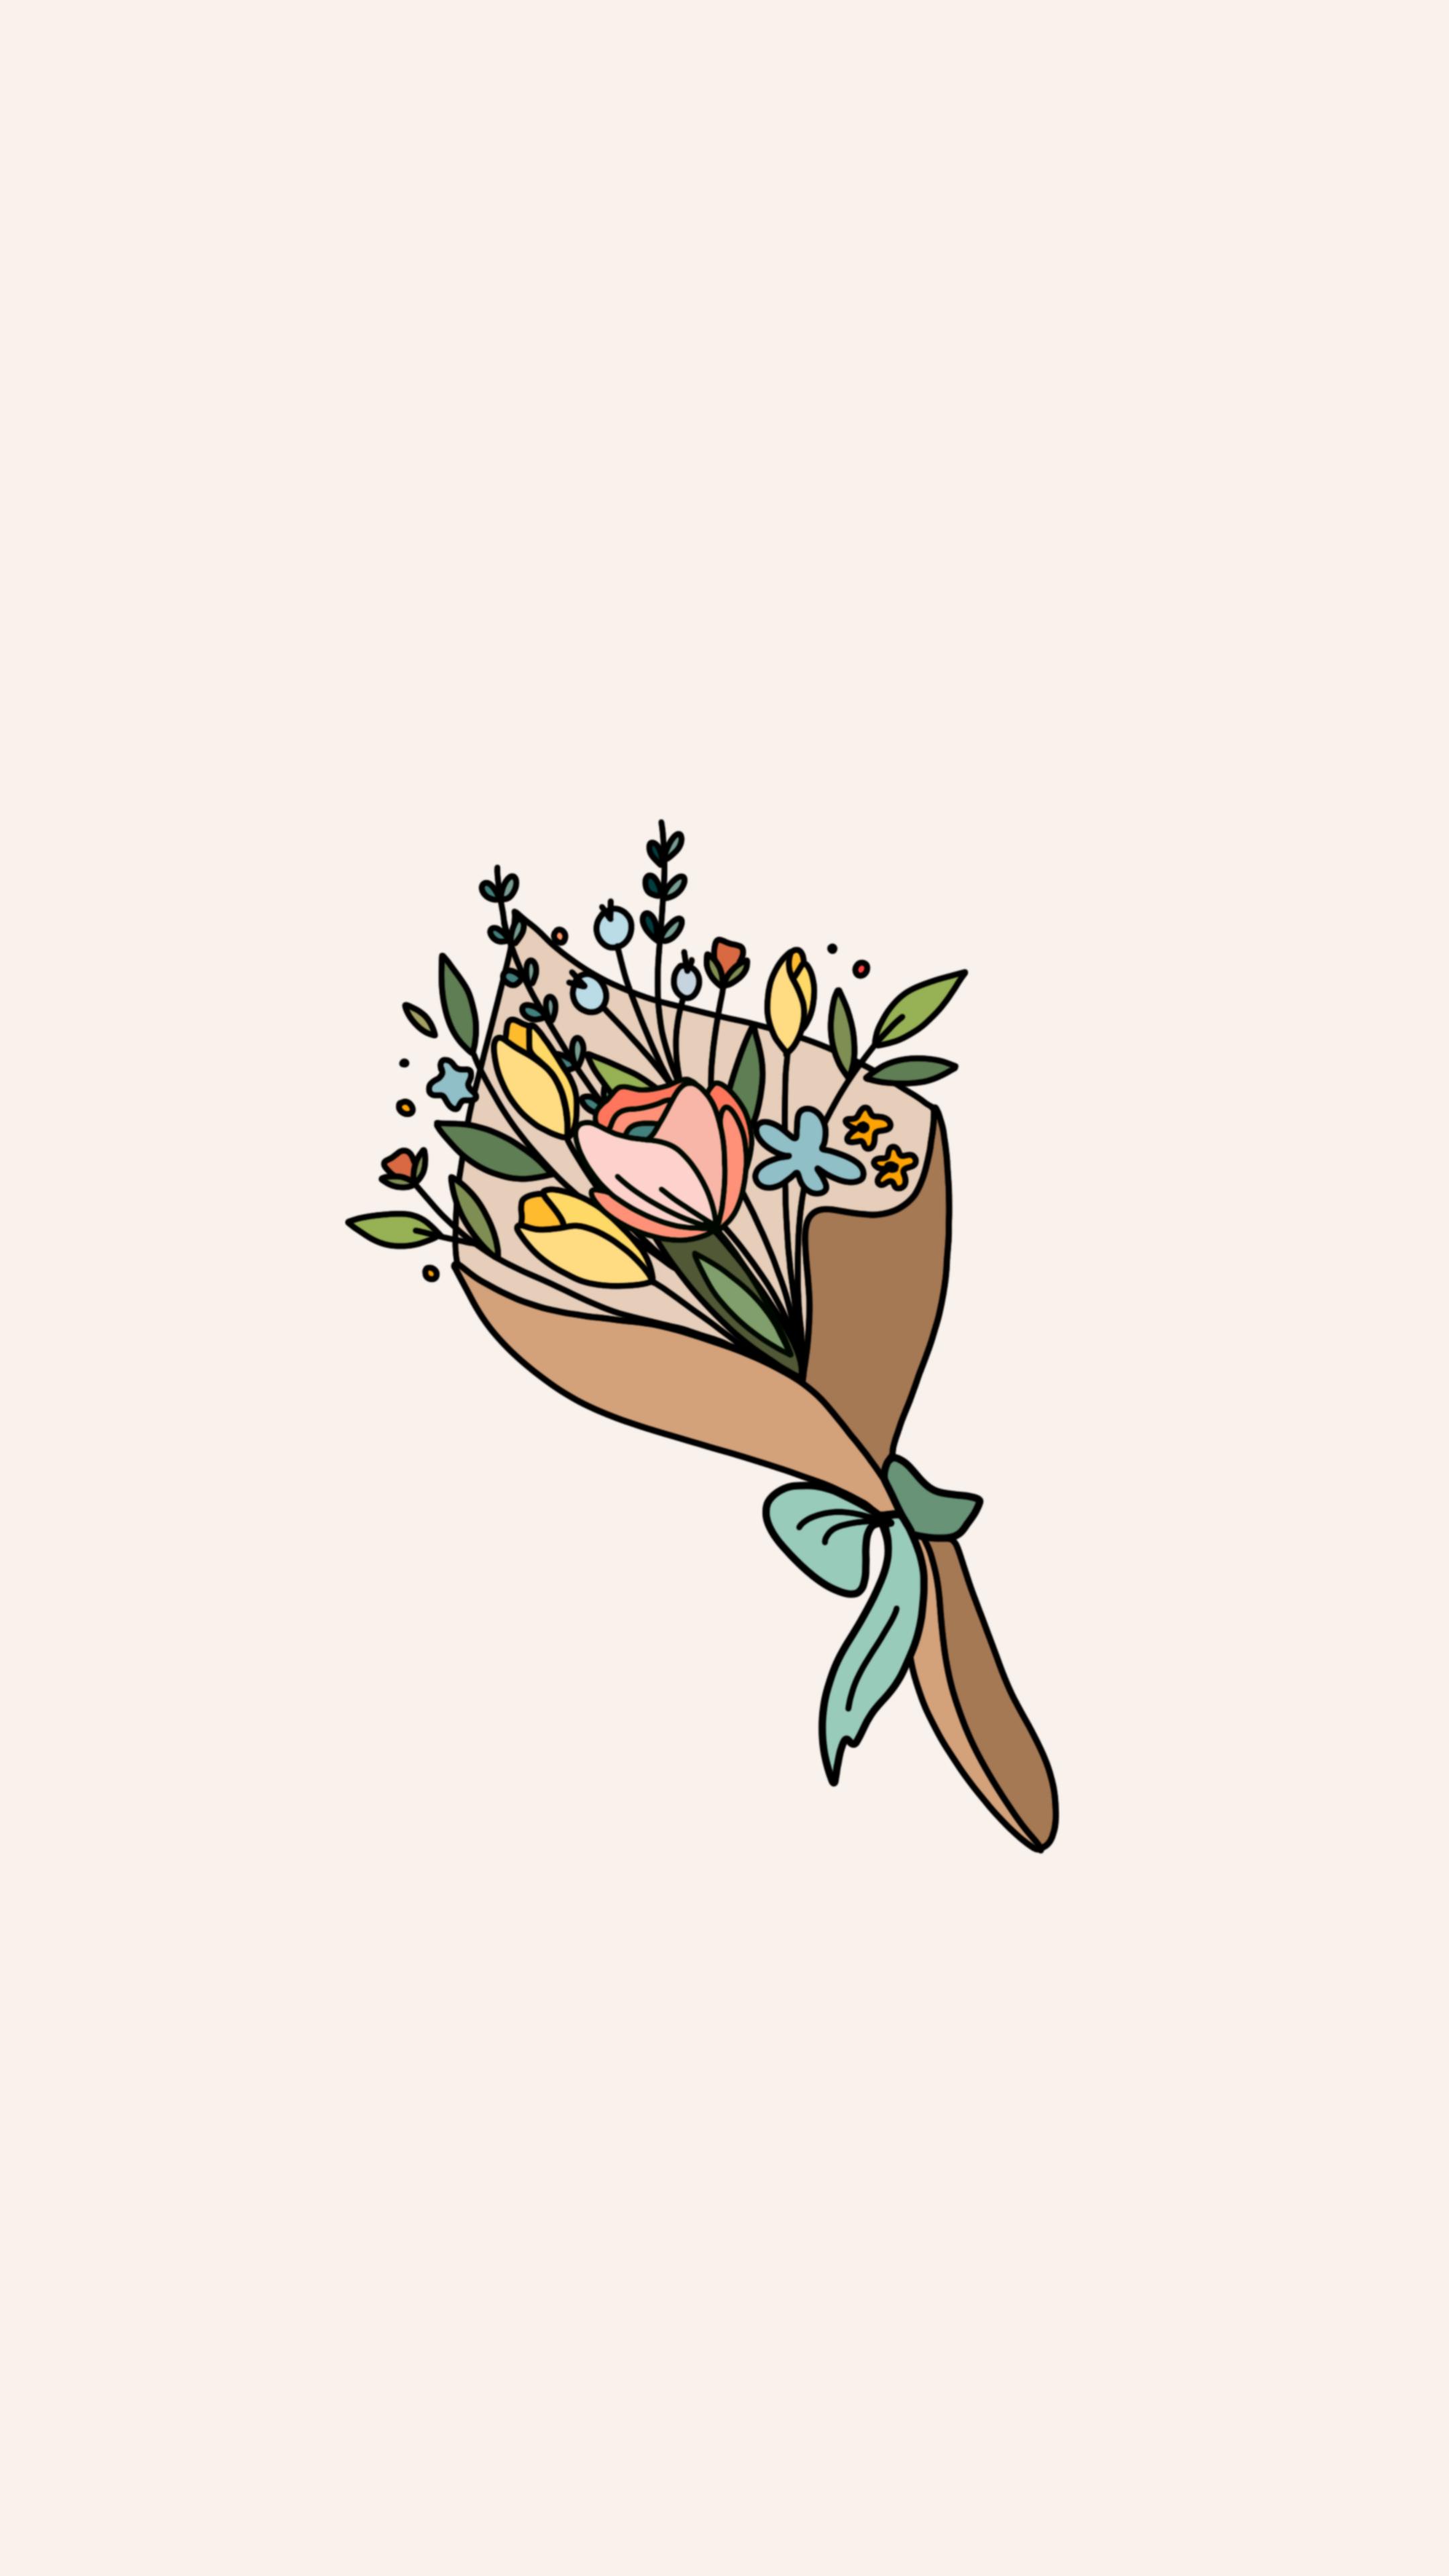 Cute Cactus Aesthetic Drawing